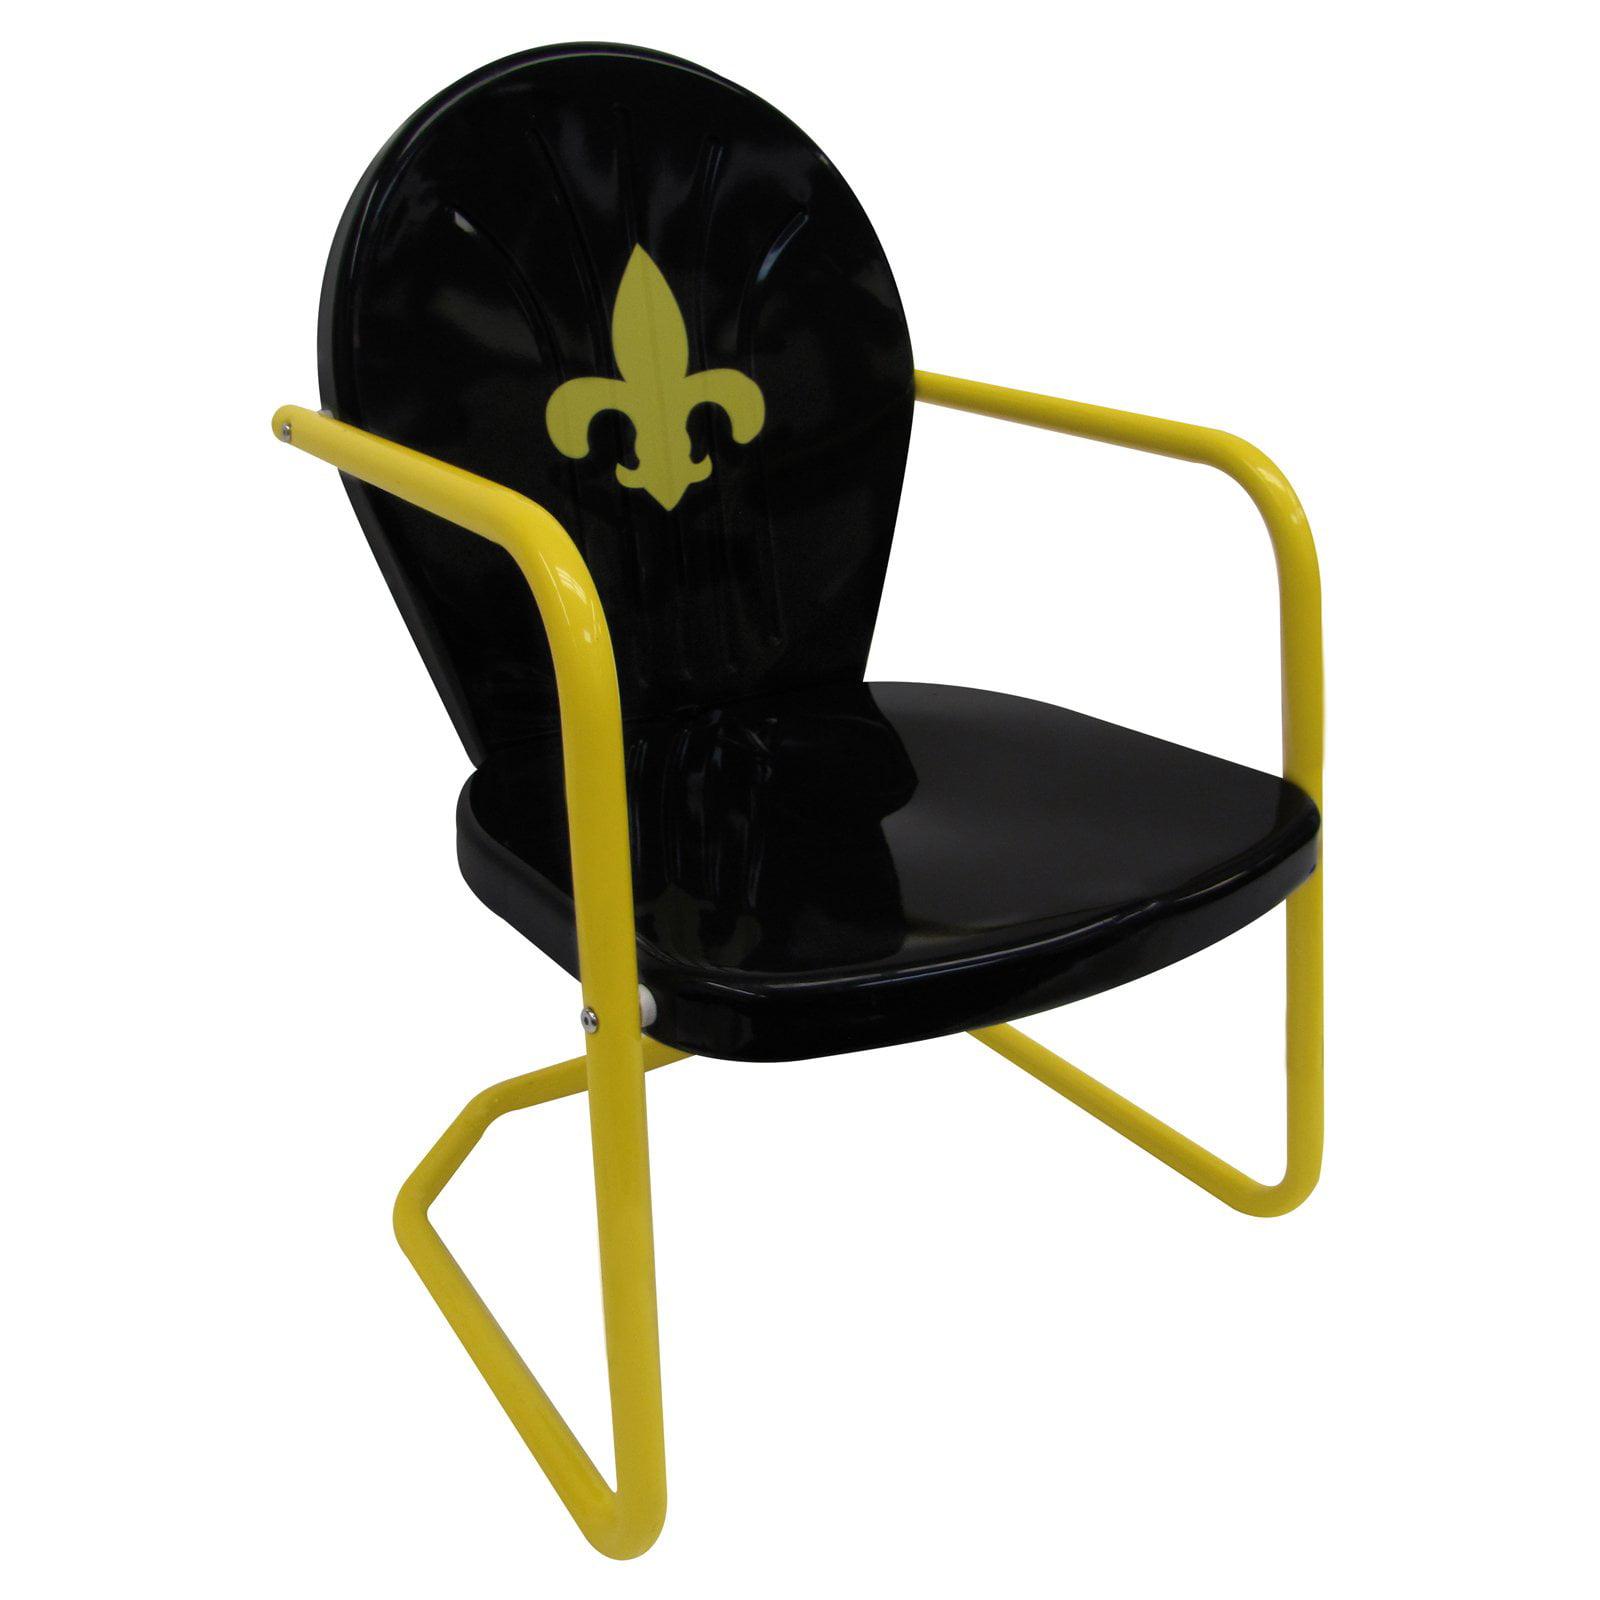 Leigh Country Retro Red Metal Bounce Chair - Fleur De Lis - Black/Yellow